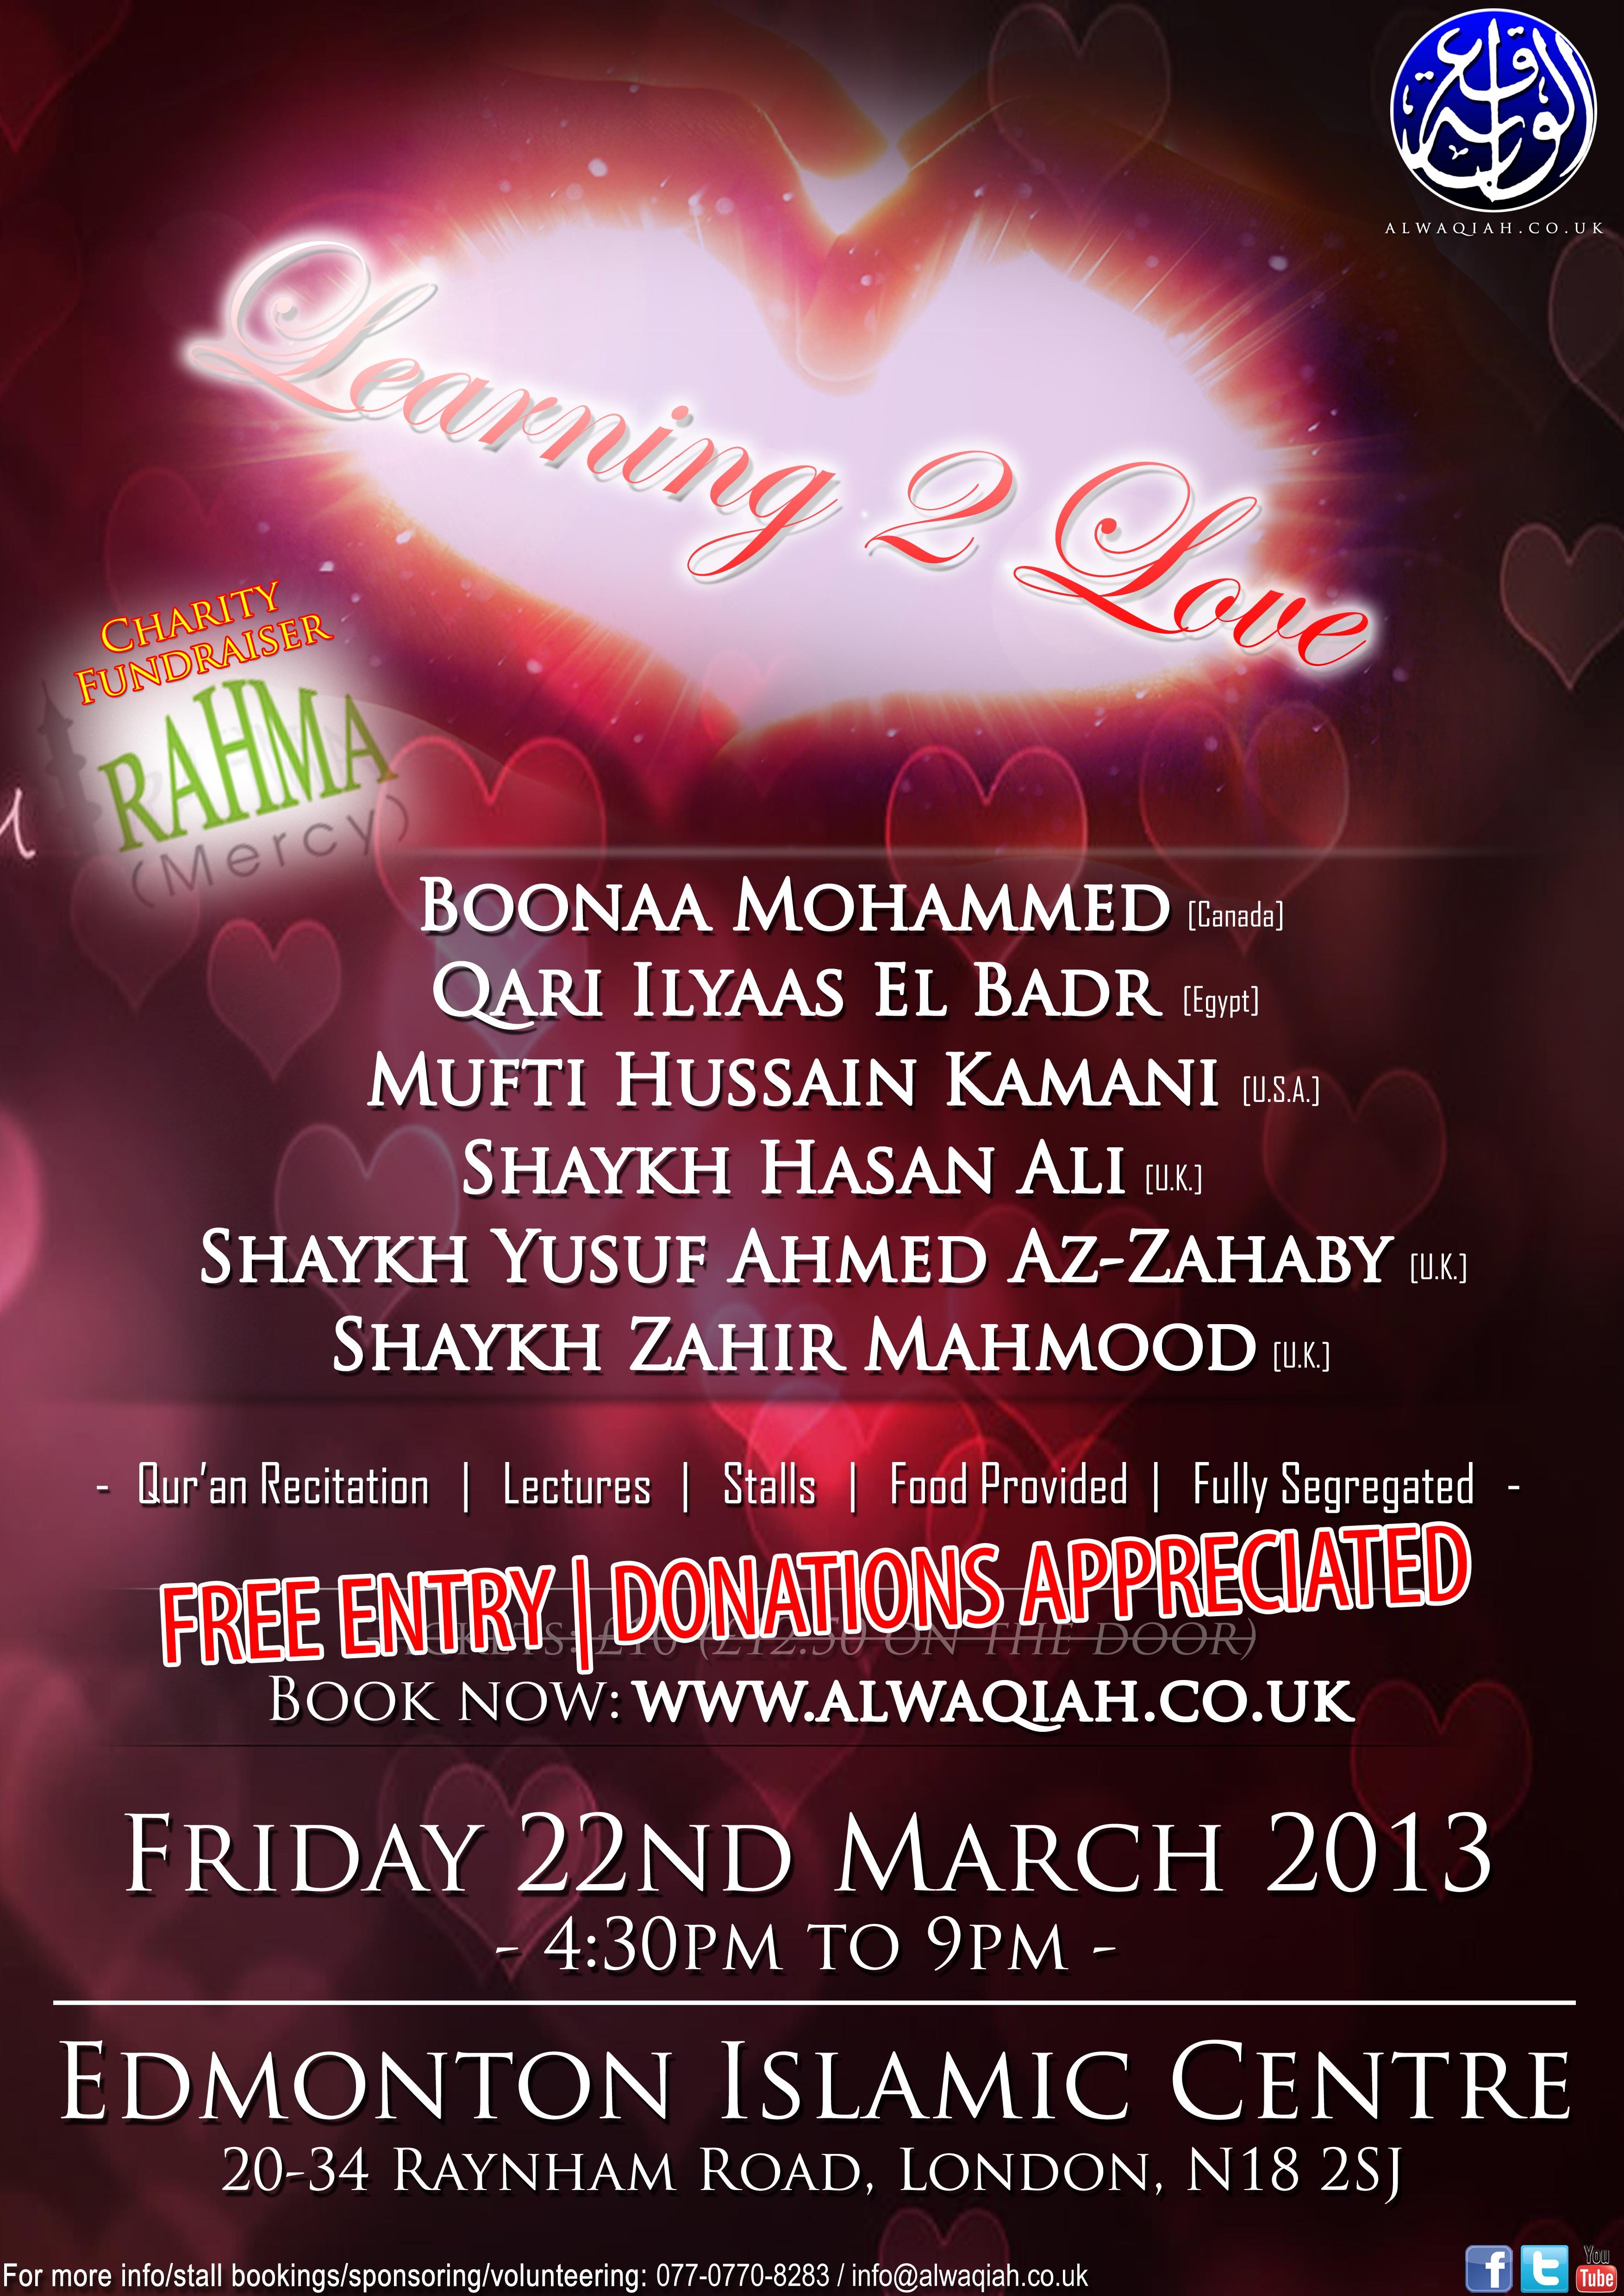 LEARNING 2 LOVE | Boonaa Mohammed, Qari Ilyaas El Badr, Mufti Hussain Kamani, Shaykh Hasan Ali, Shaykh Yusuf Ahmed Az-Zahaby & Shaykh Zahir Mahmood